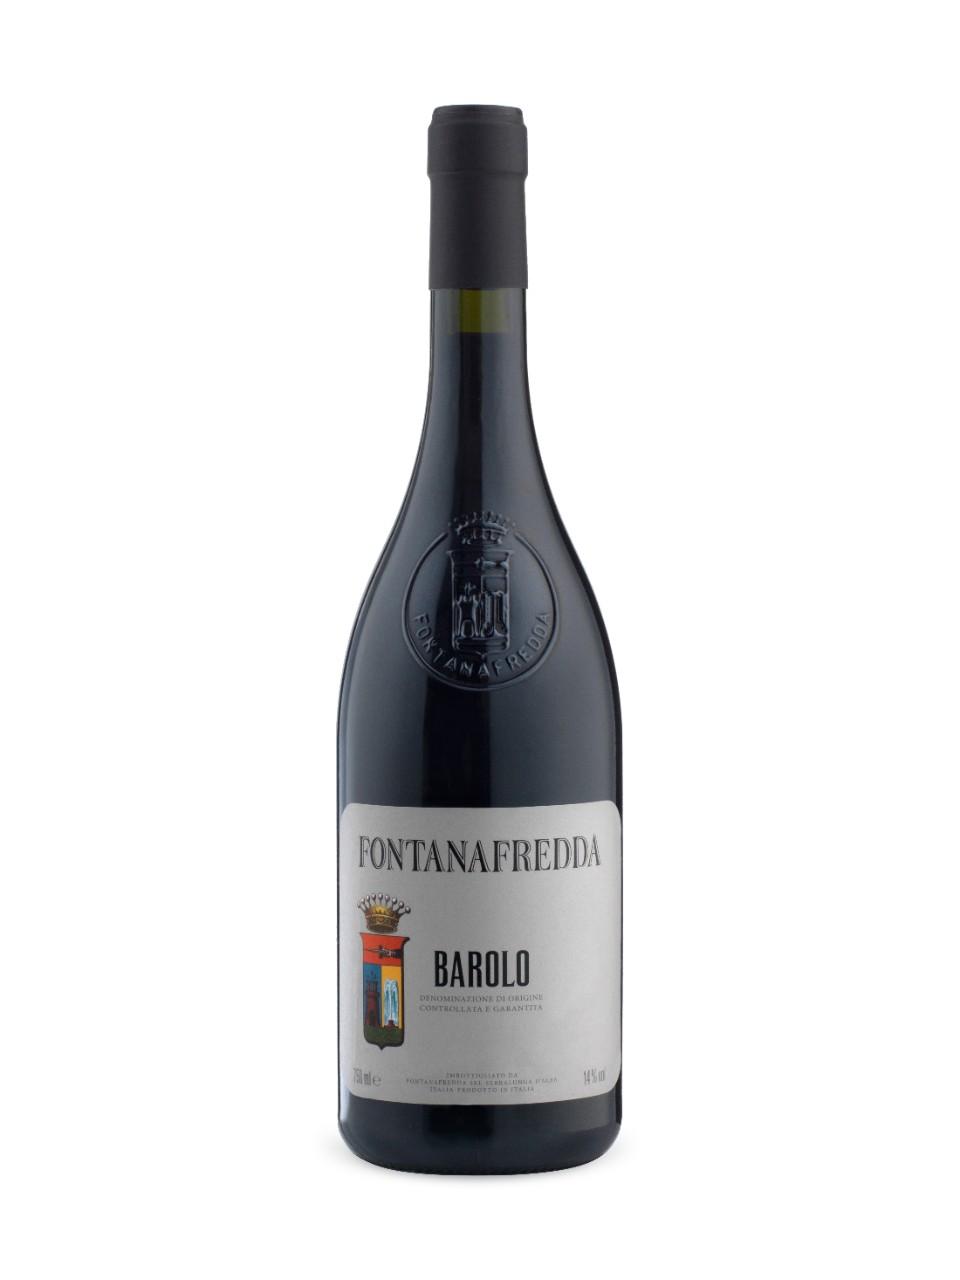 Fontanafredda's value priced Barolo ($29.95 @ LCBO)